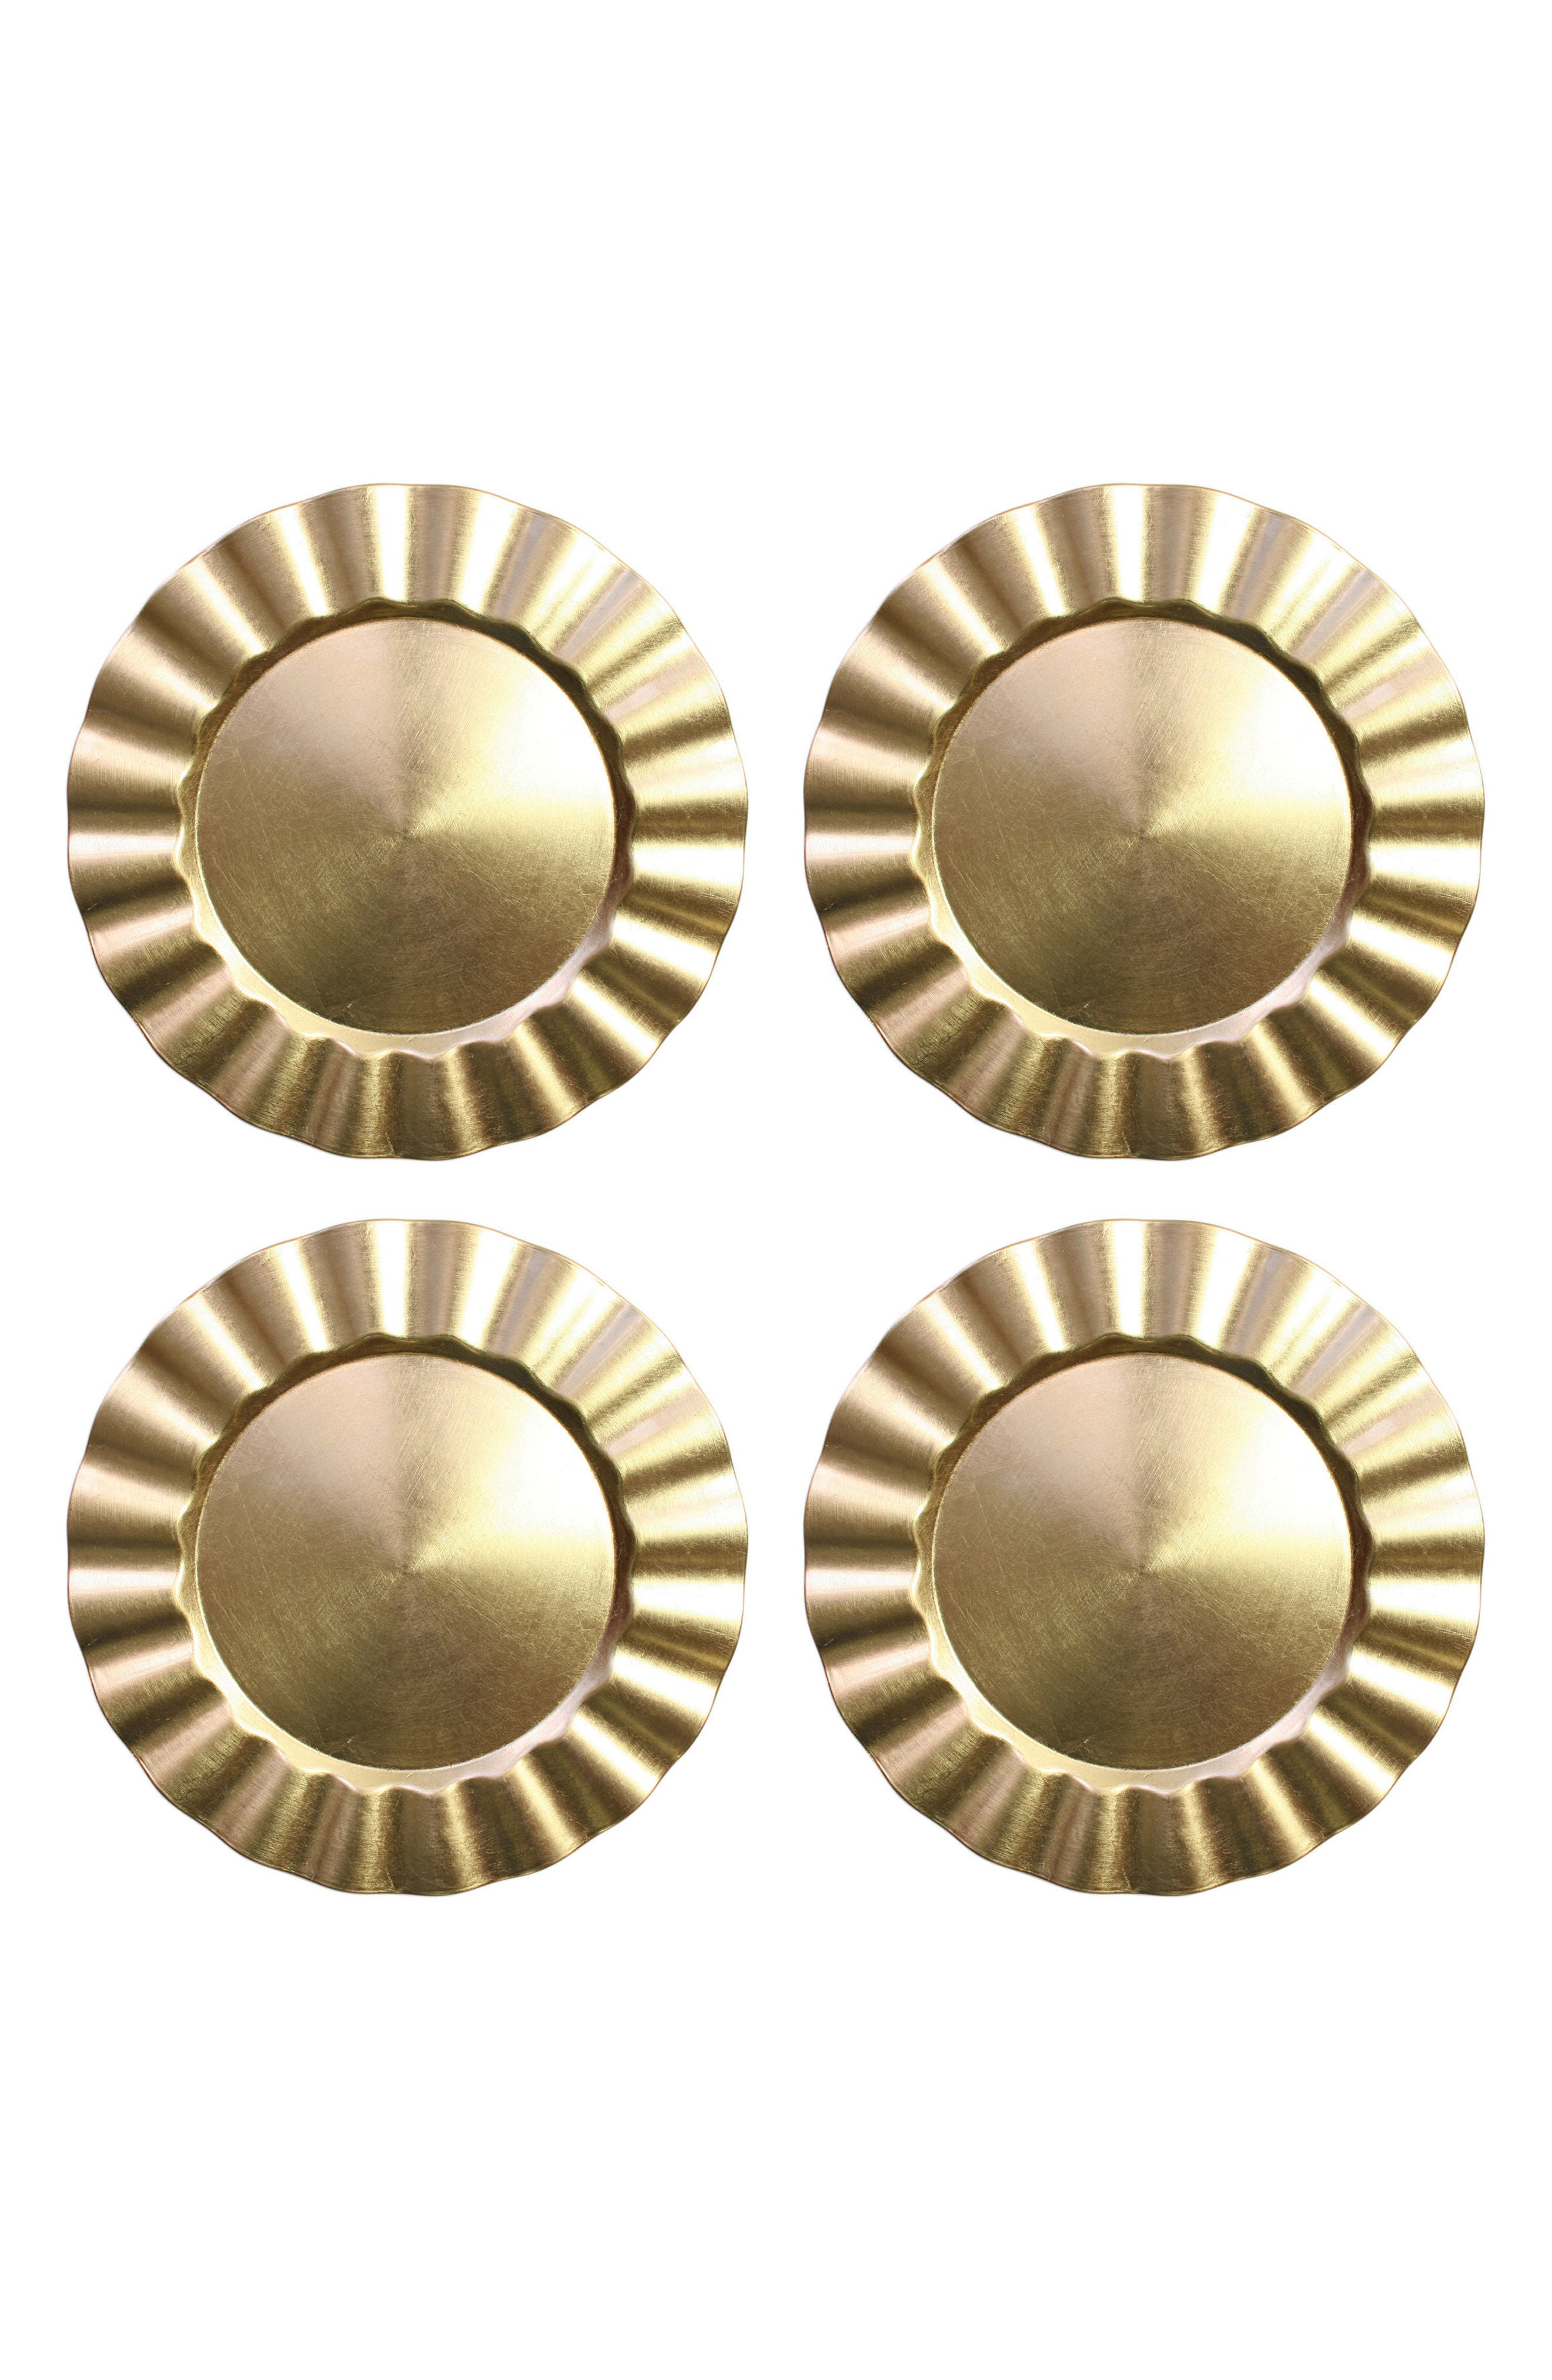 Set of 4 Round Ruffled Charger Plates,                             Main thumbnail 1, color,                             Metallic Gold